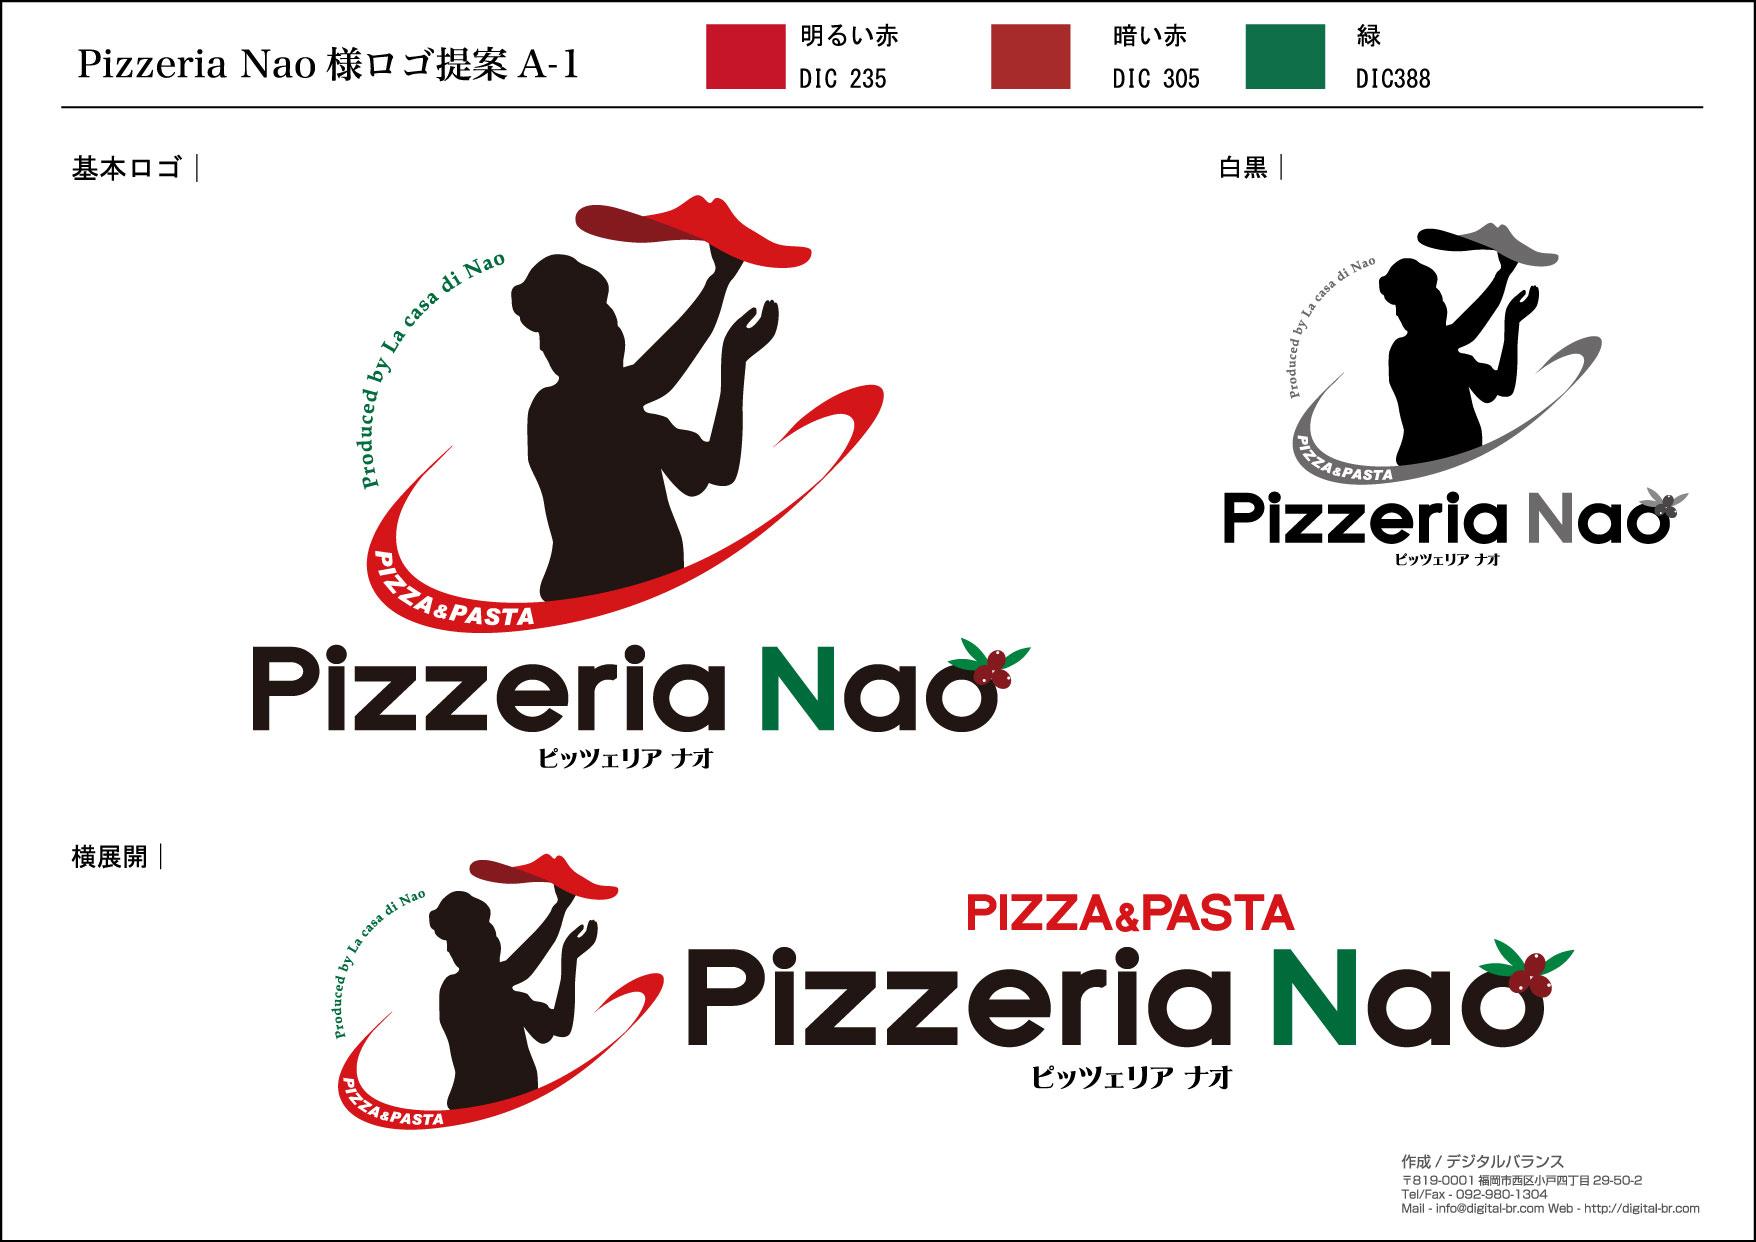 Pizzeria-Nao_ロゴA-1案OL.jpg